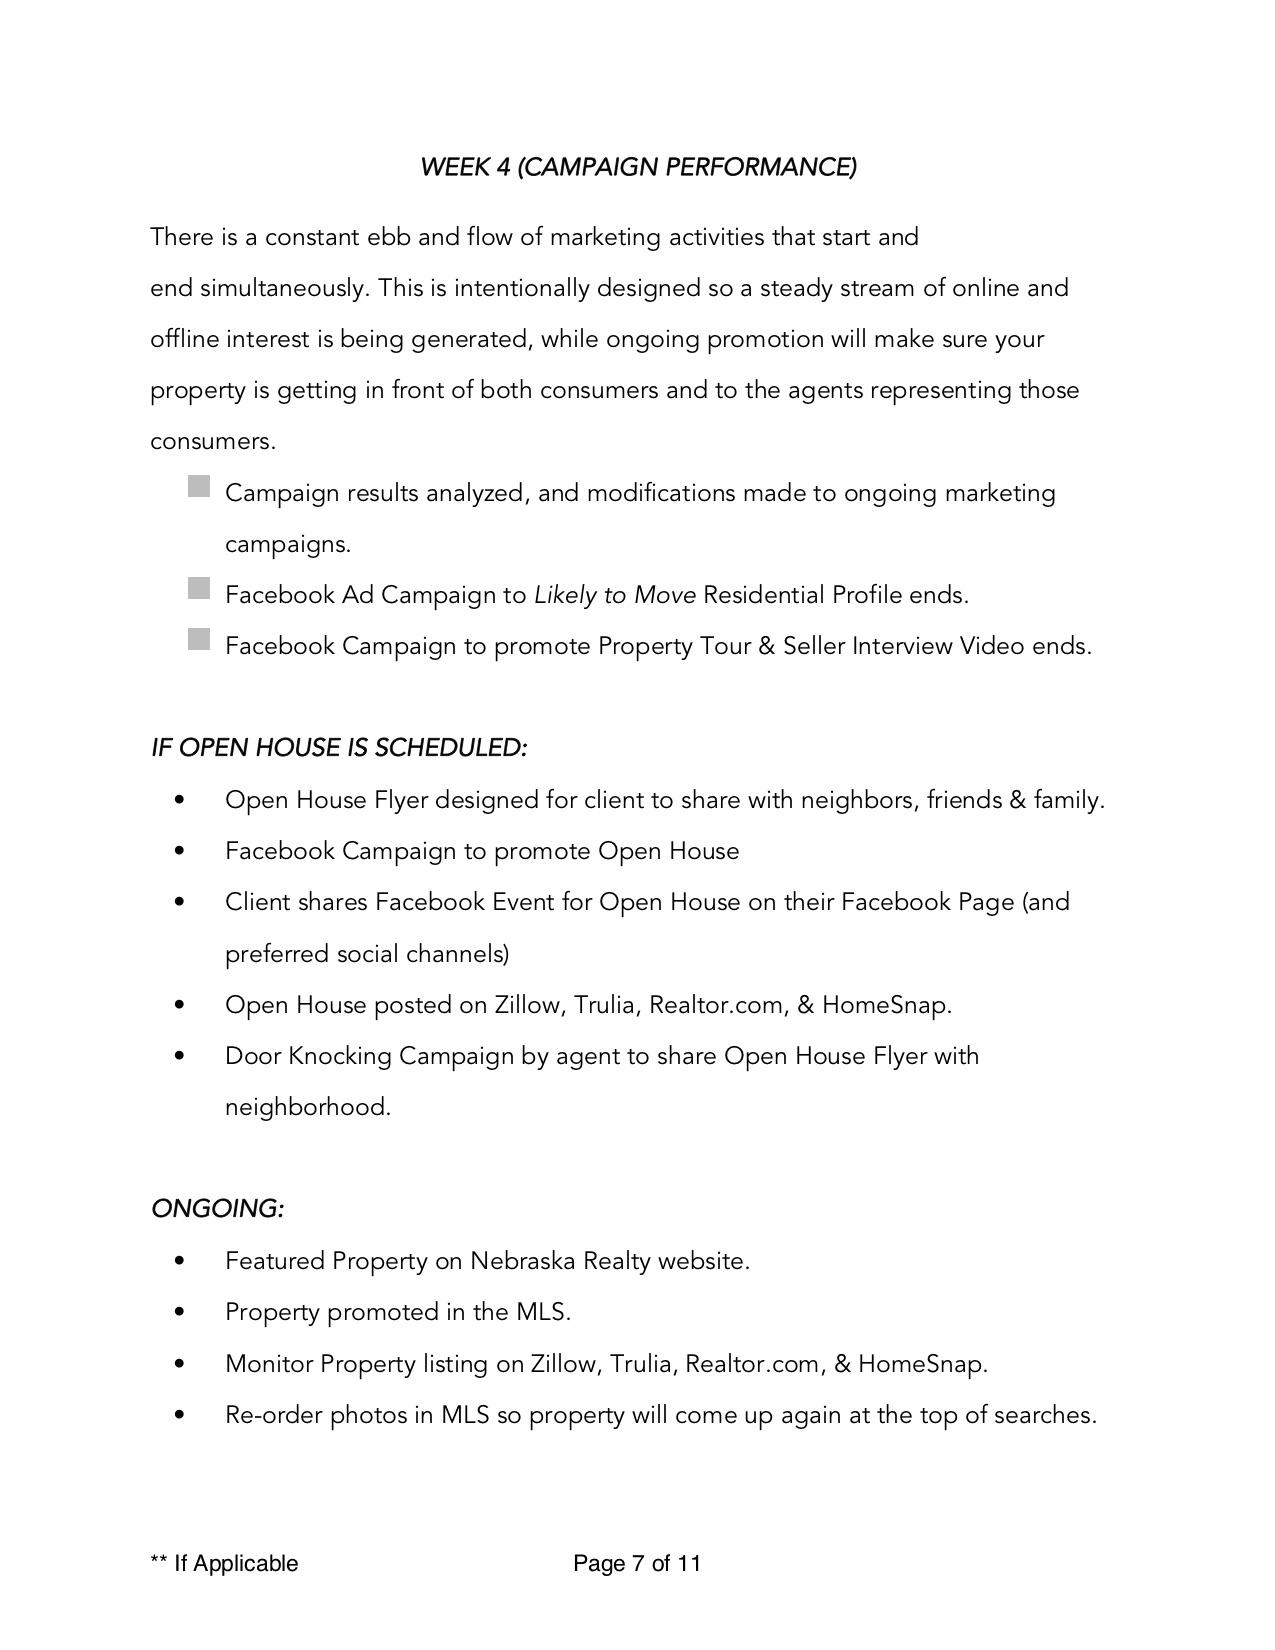 8 Week Marketing Plan7.jpg